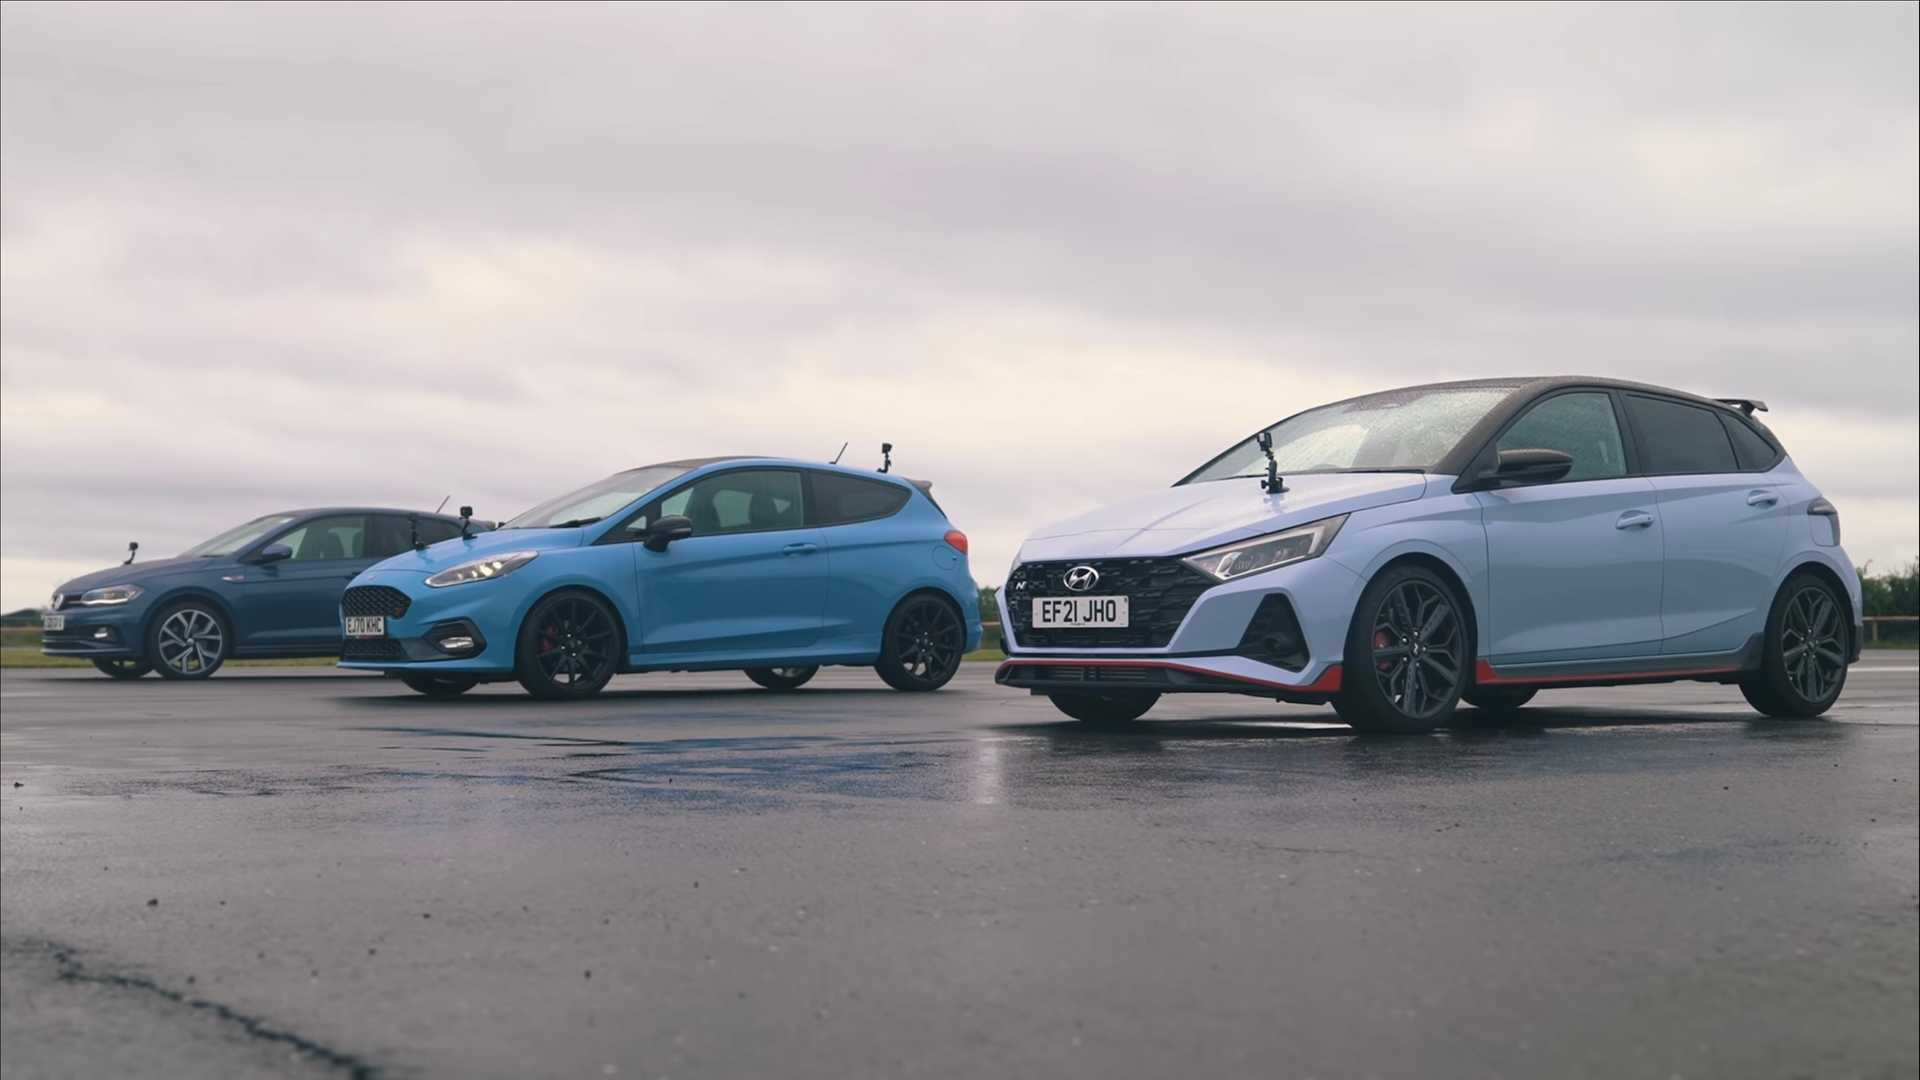 Fiesta ST, Polo GTI, I20 N Fight In Forbidden Hot Hatch Drag Race - Todayuknews - Todayuknews